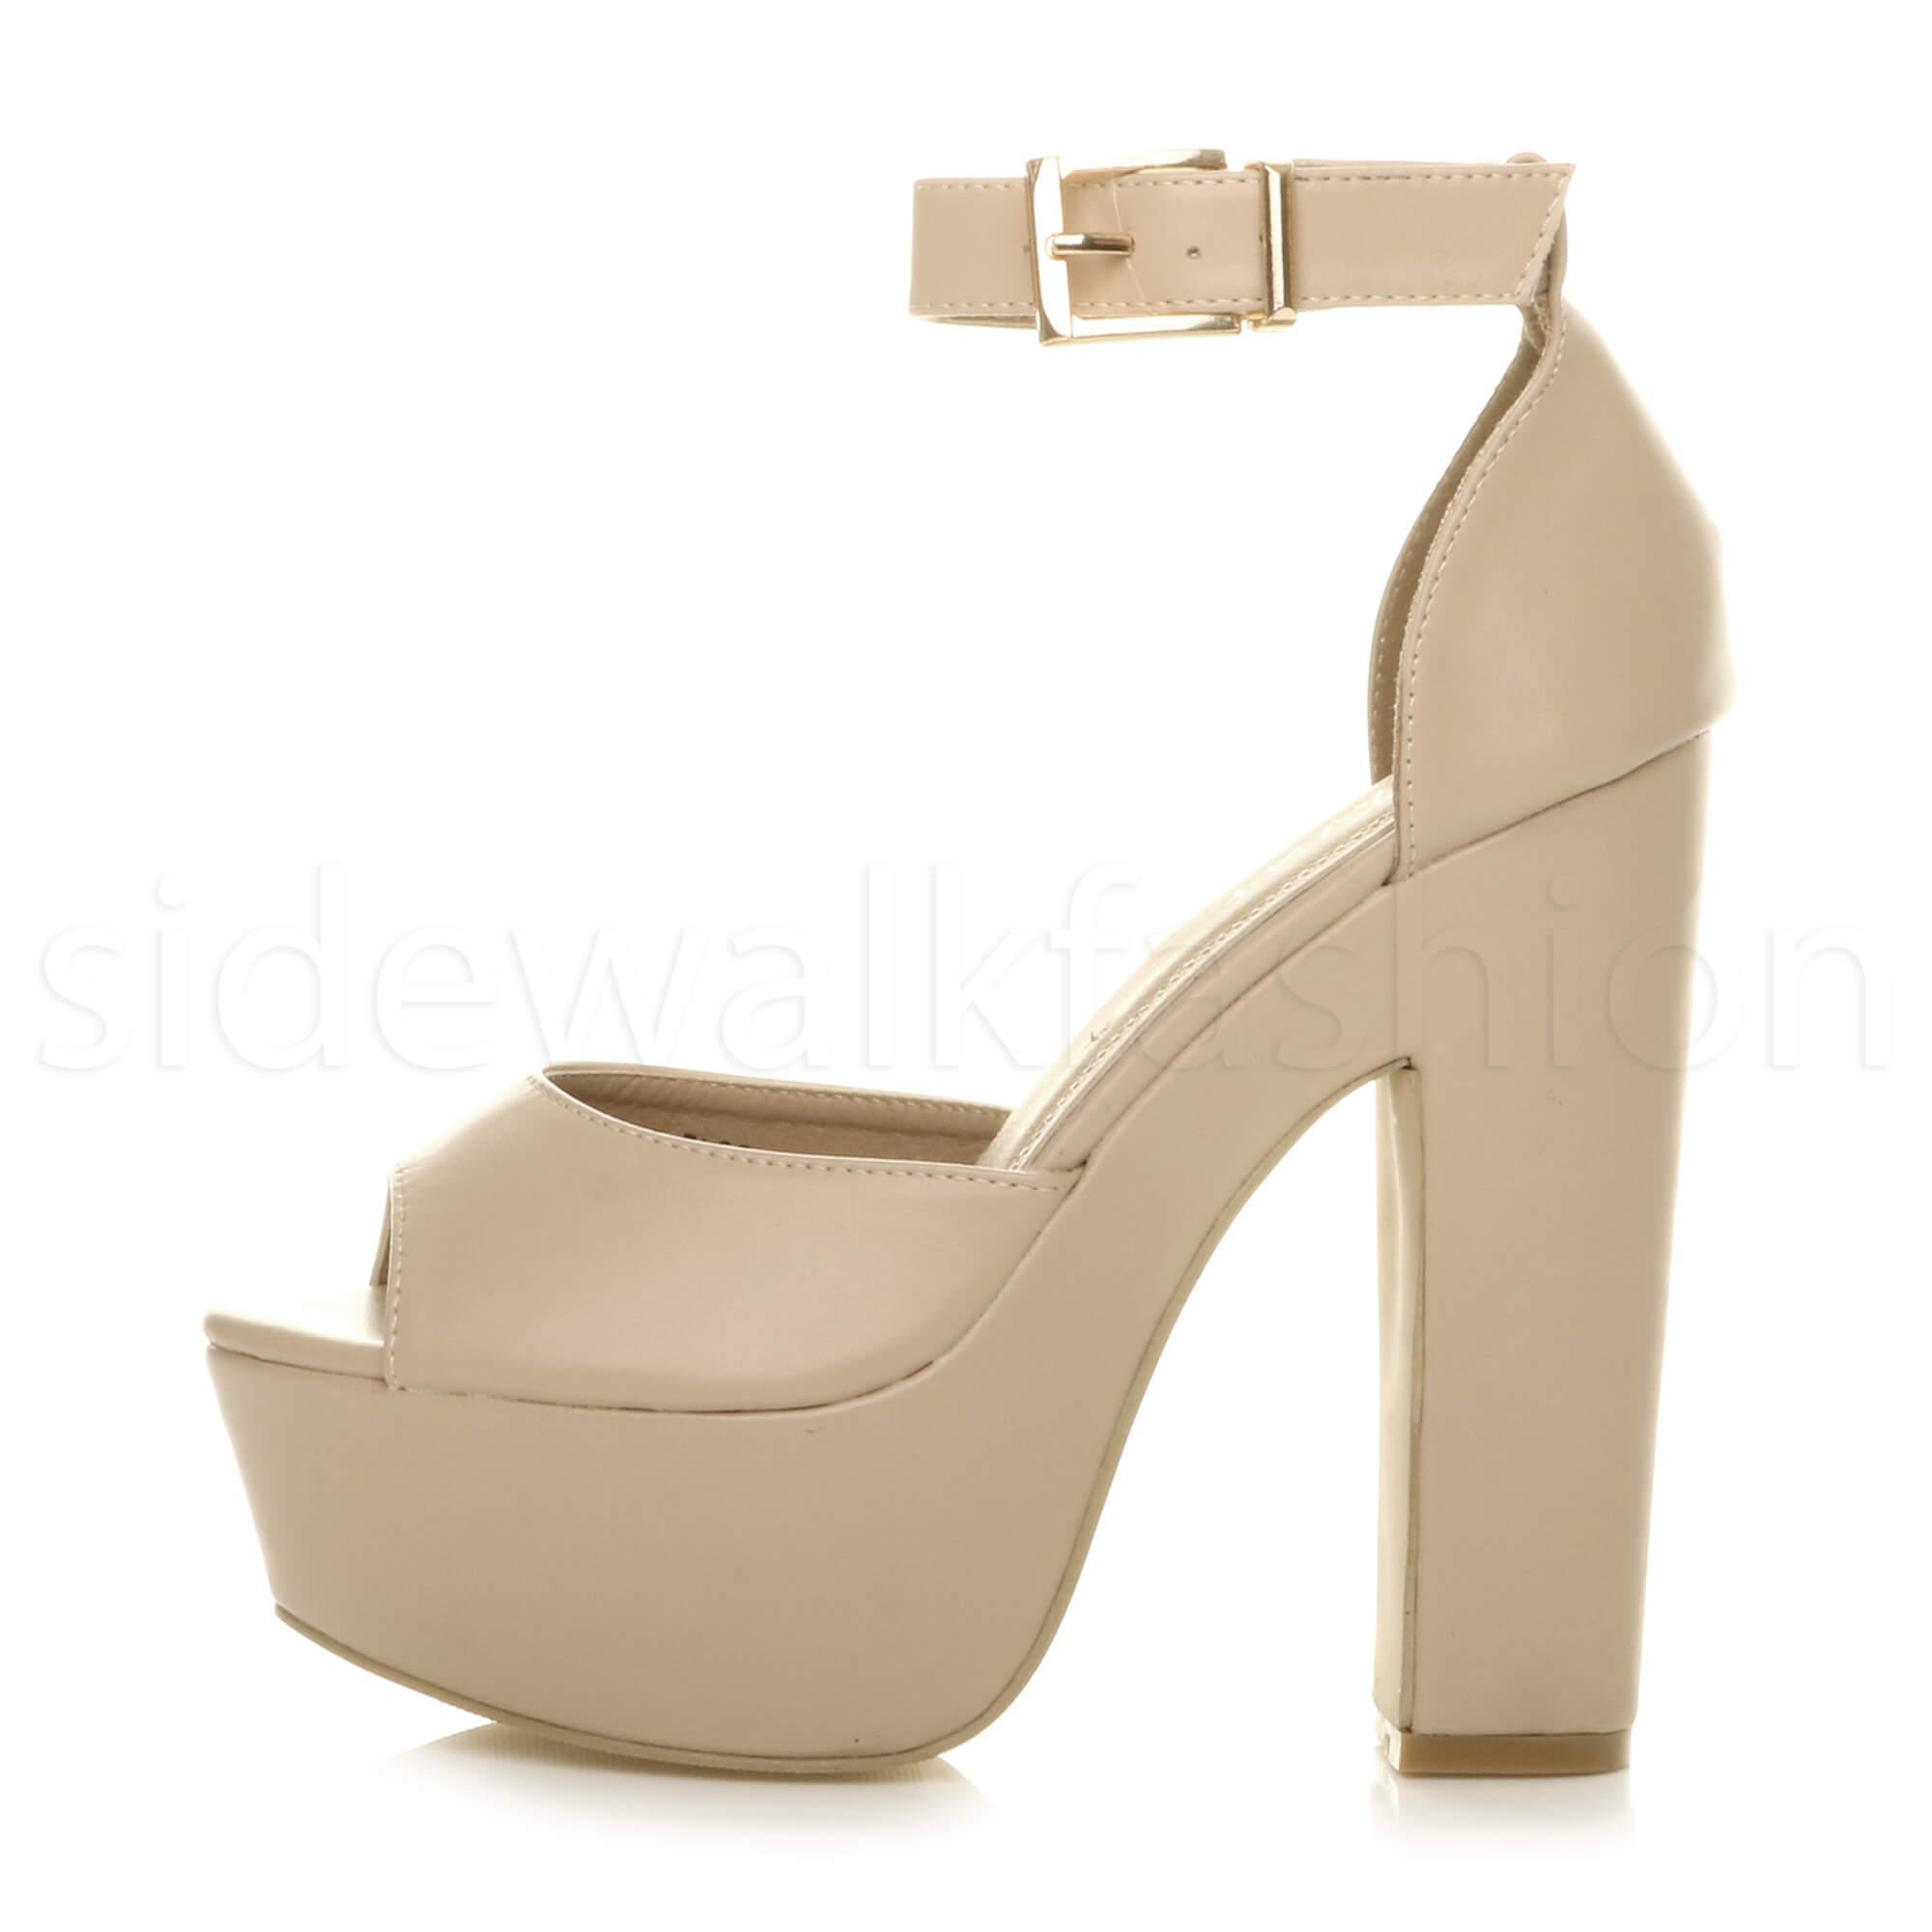 Womens-ladies-high-block-heel-peep-toe-shoes-evening-party-platform-sandals-size thumbnail 18